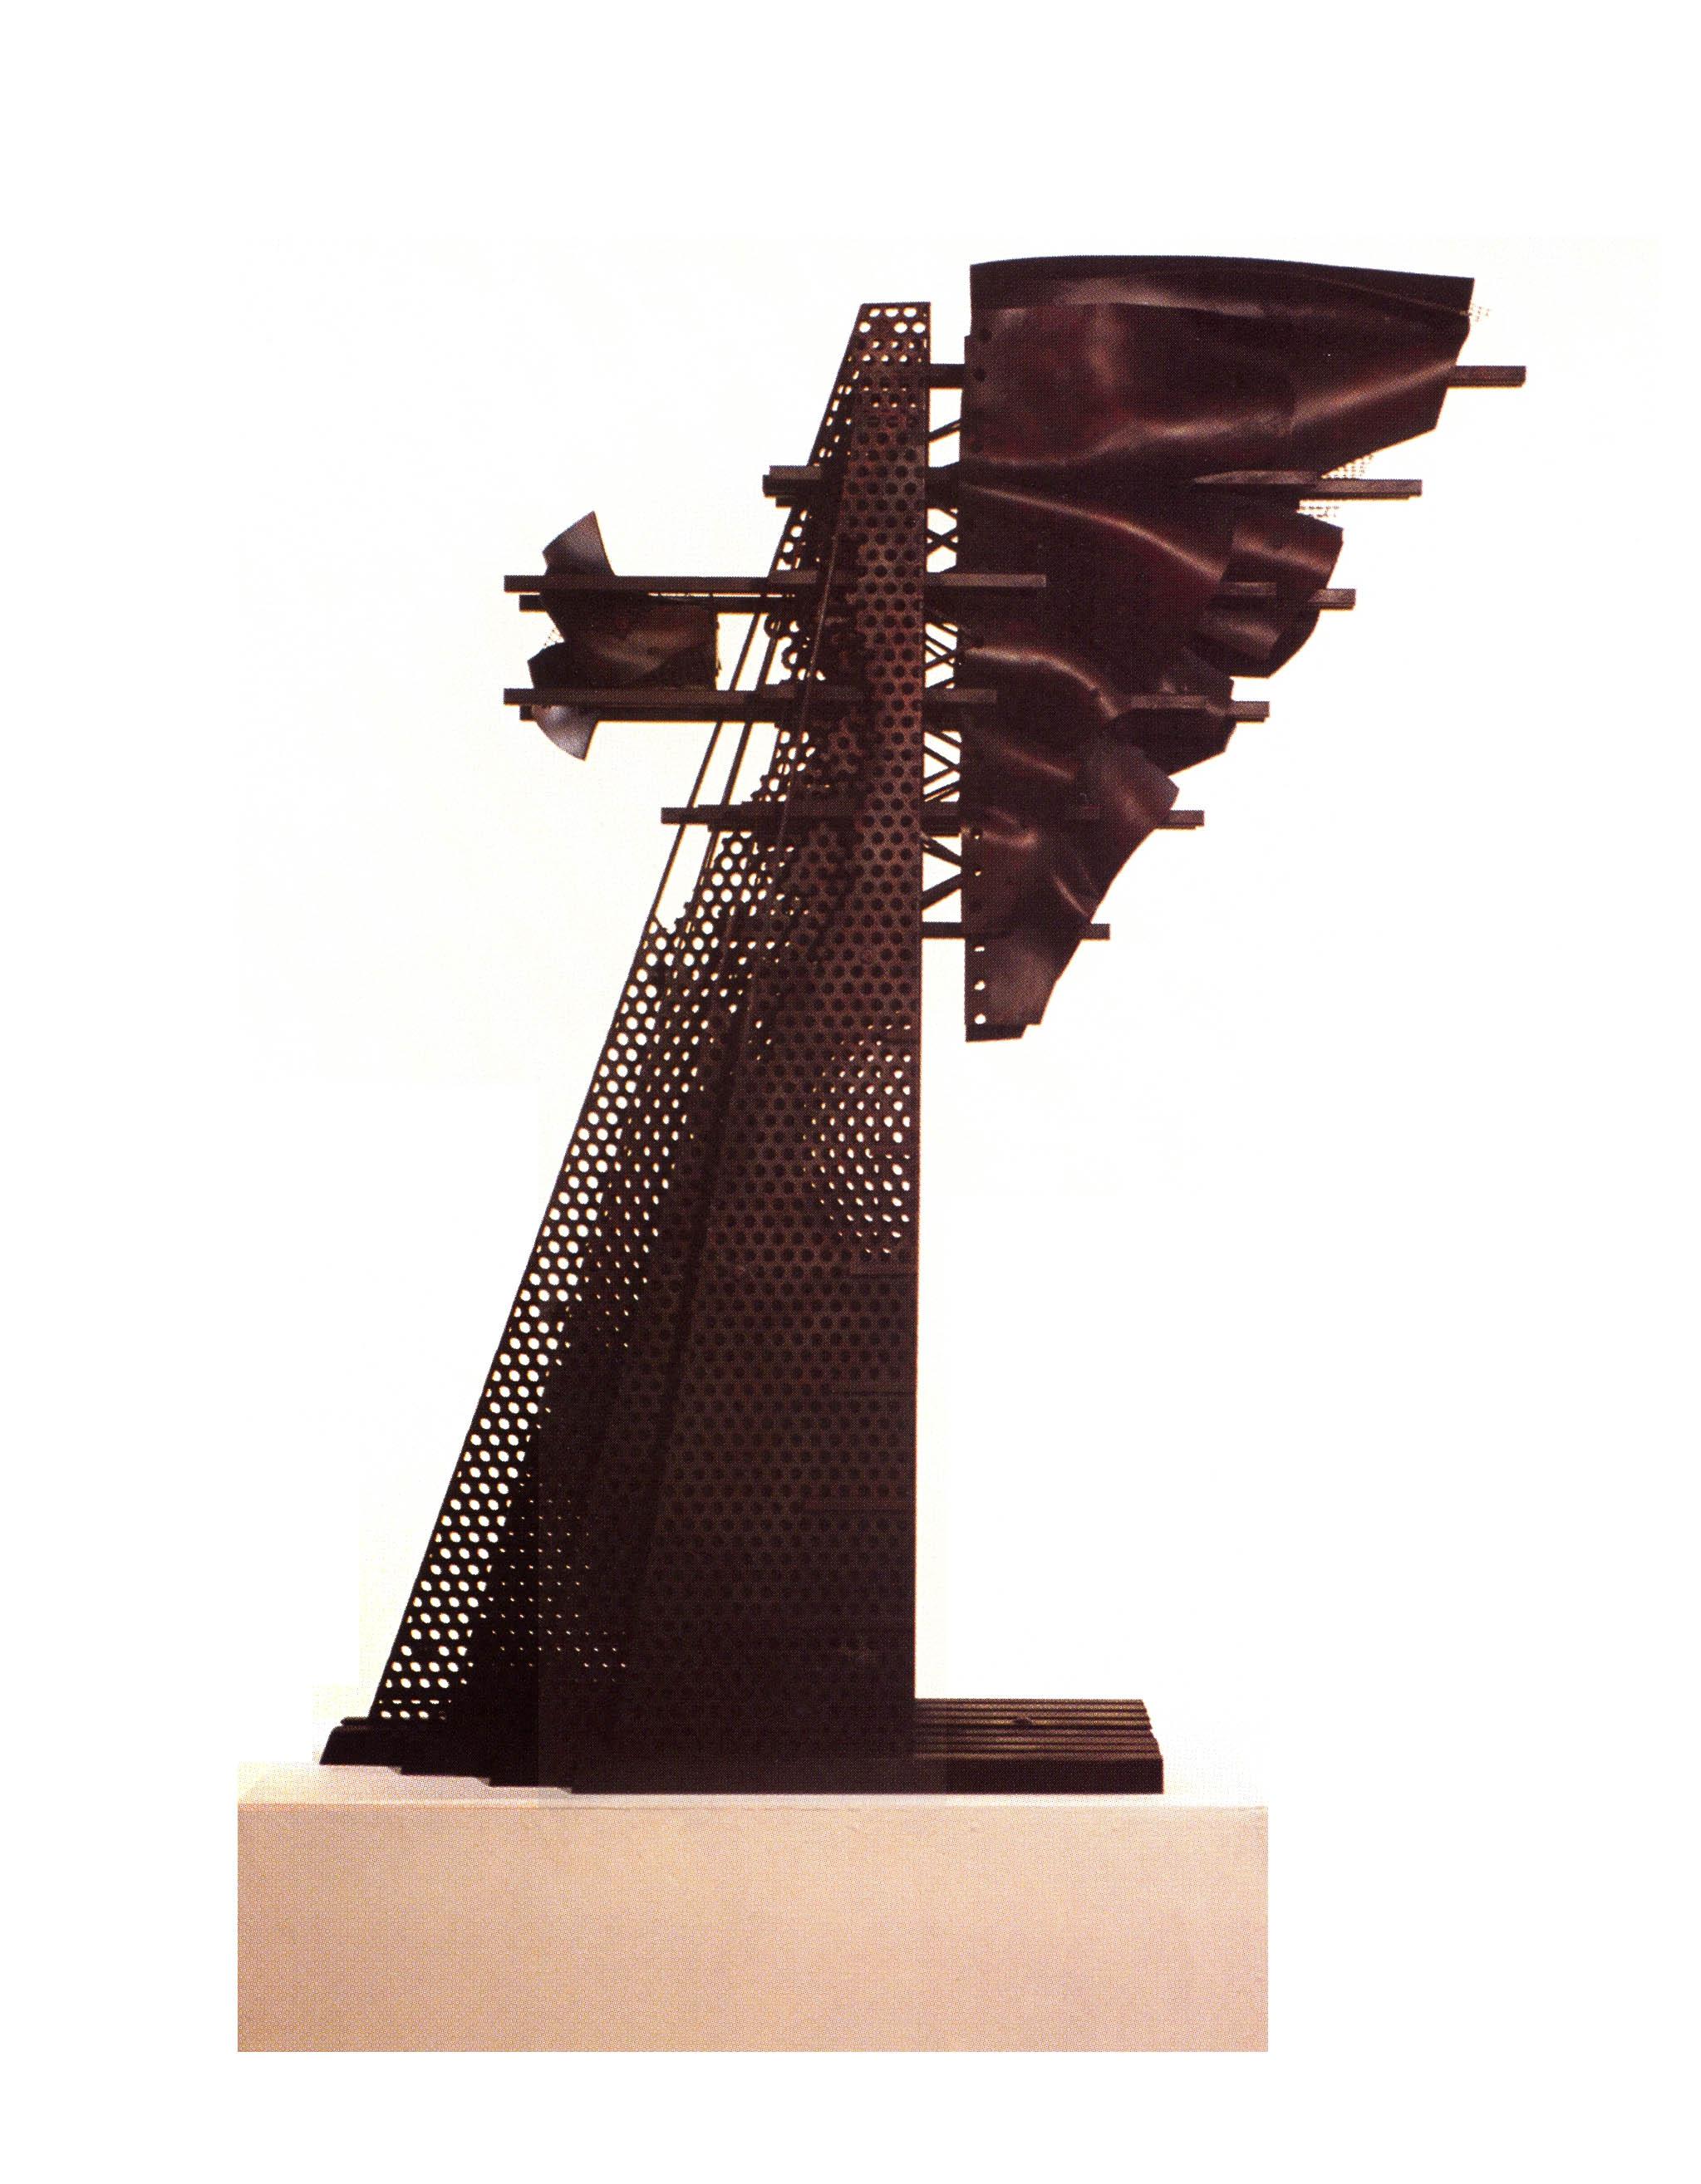 Alexy Klimov   Perforated Motion (Side View)  , Metal, Plastic, Automotive Paint, 45'' x 32'' x 12'', 2003